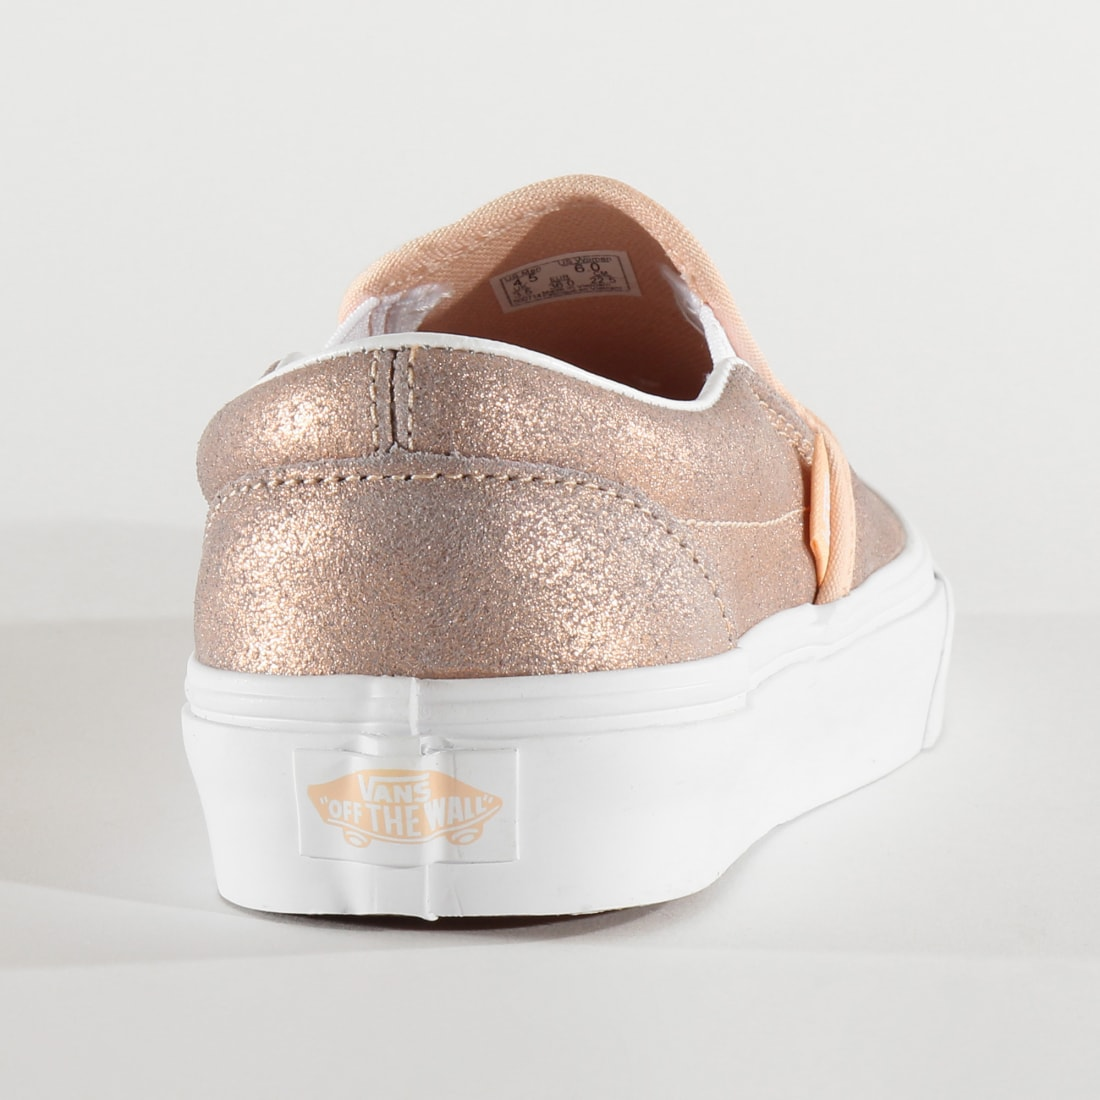 Vans Baskets Femme Classic Slip On BV3T61 Rose Gold